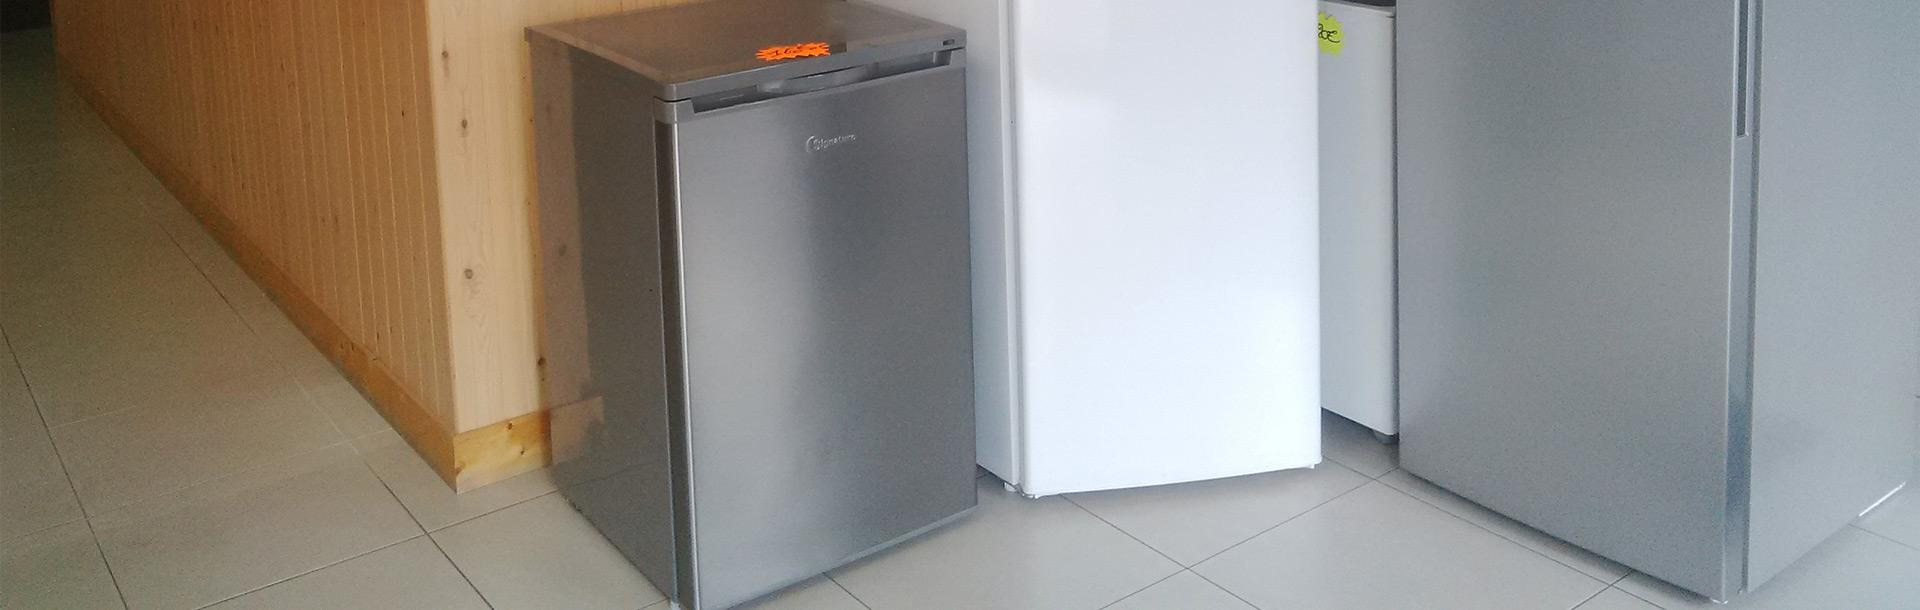 location refrigerateur 40